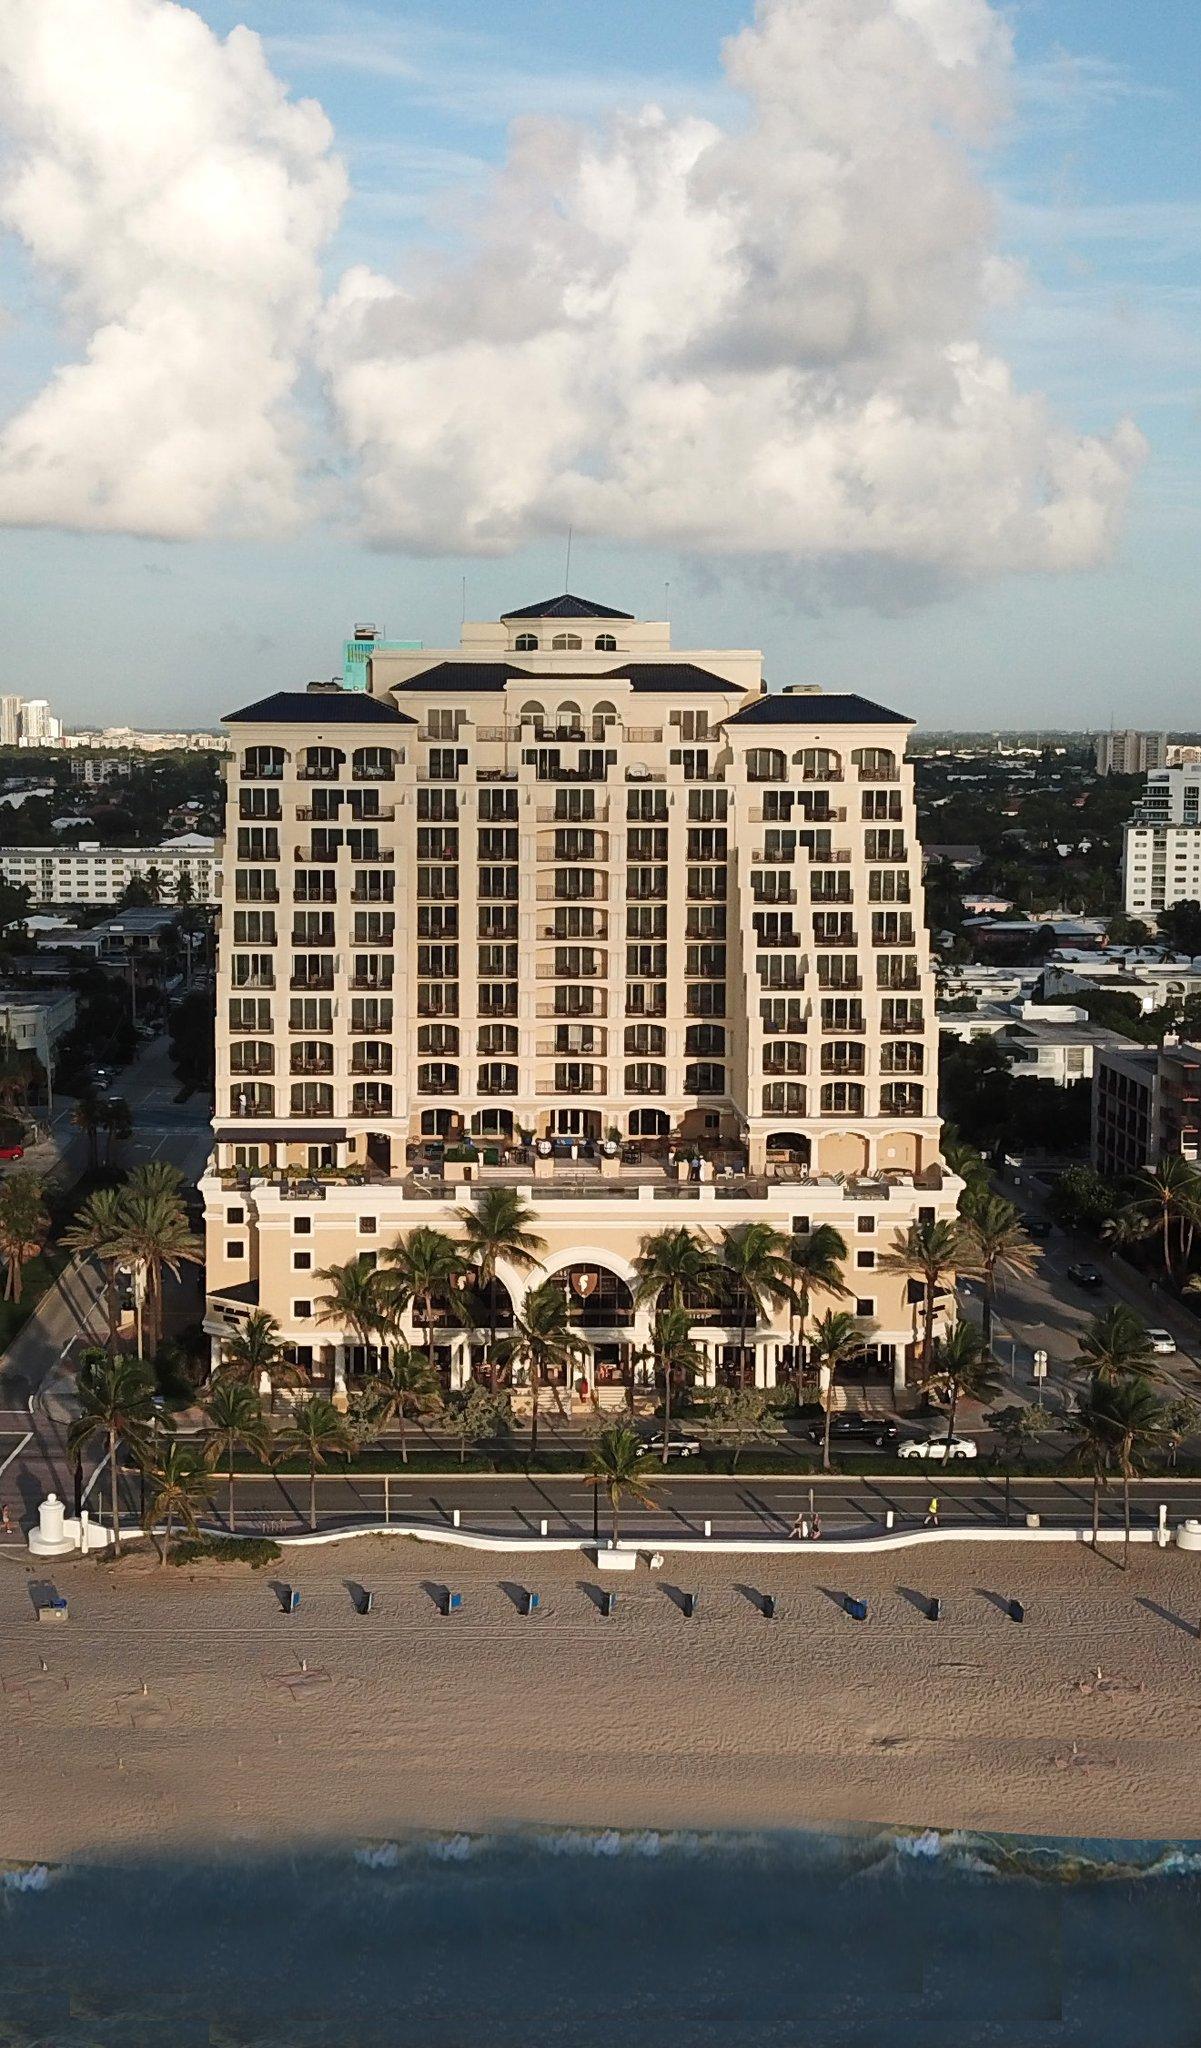 The Atlantic Hotel & Spa